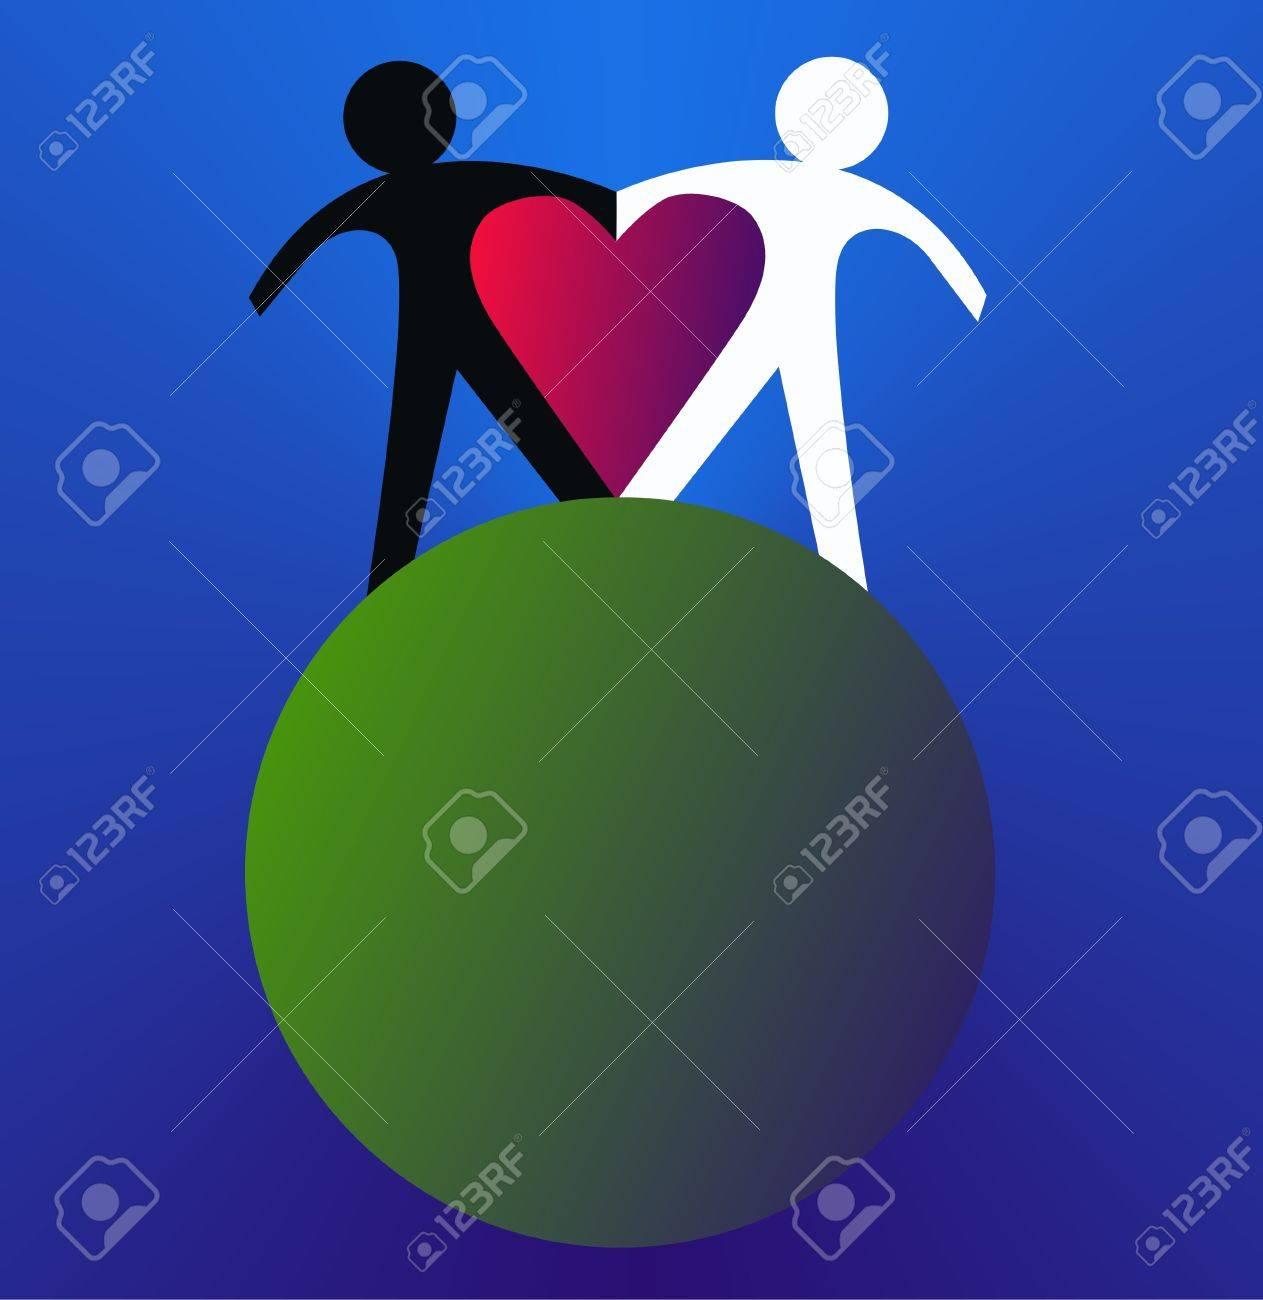 love peace freedom Stock Vector - 10864387